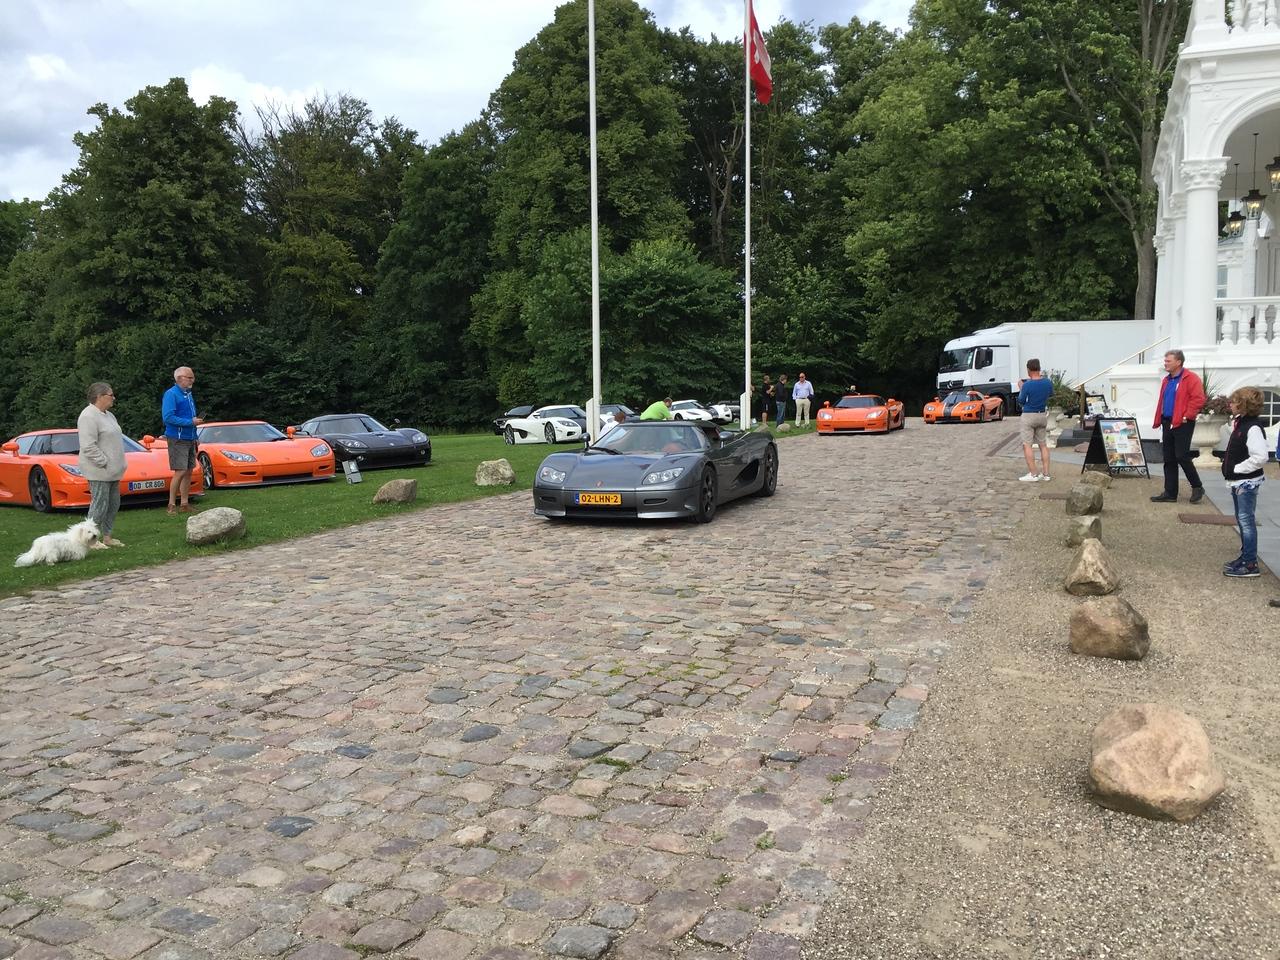 Koenigsegg, Kokkedal Slot, Hørsholm